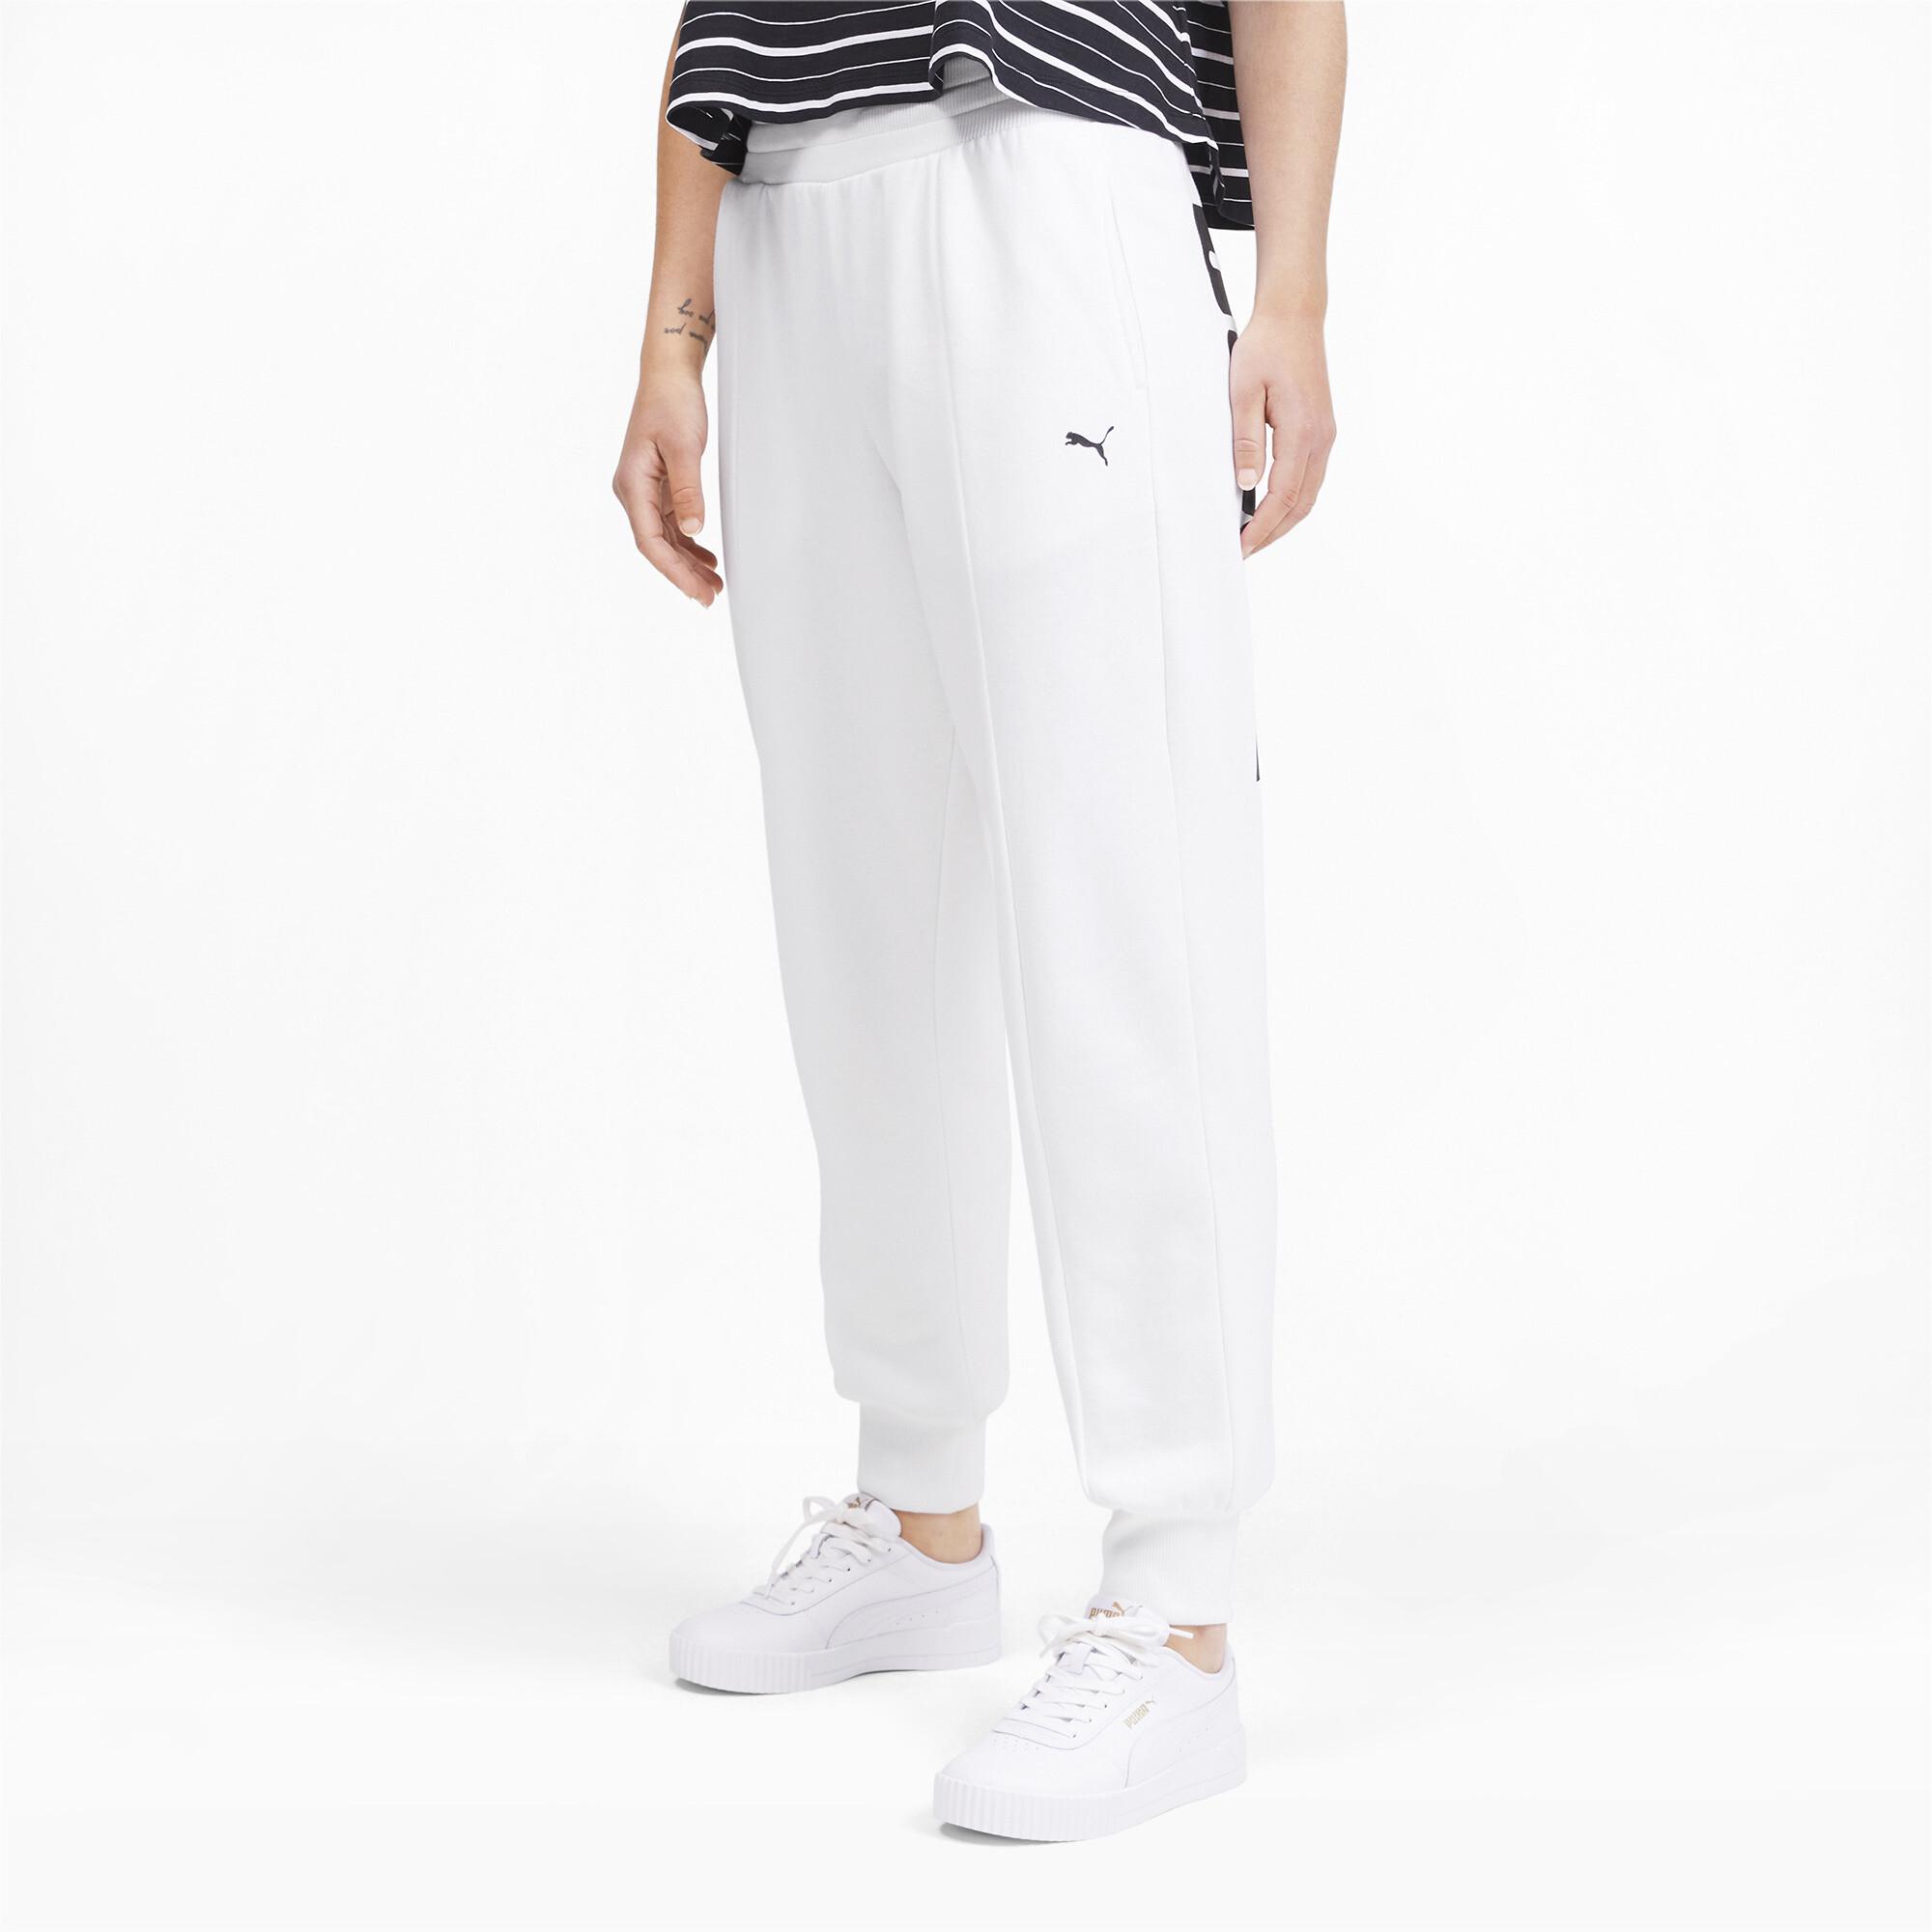 PUMA-Rebel-Women-039-s-Sweatpants-Women-Knitted-Pants-Basics thumbnail 9